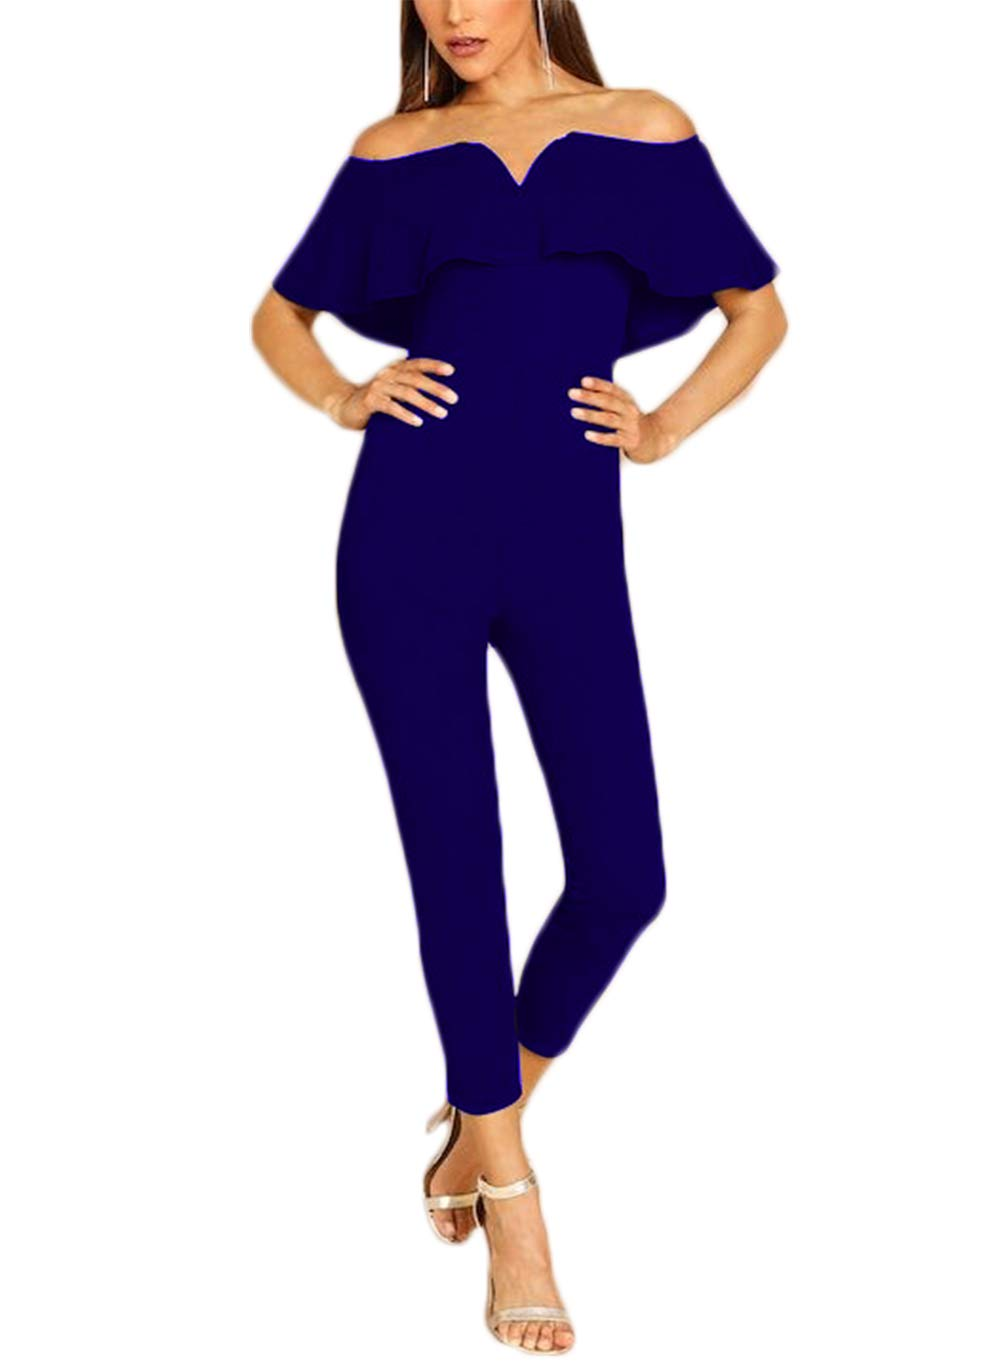 Women's V Neck Off Shoulder Bodycon Jumpsuit Ruffled Elegant Sexy Night Clubwear Skinny Romper Playsuit